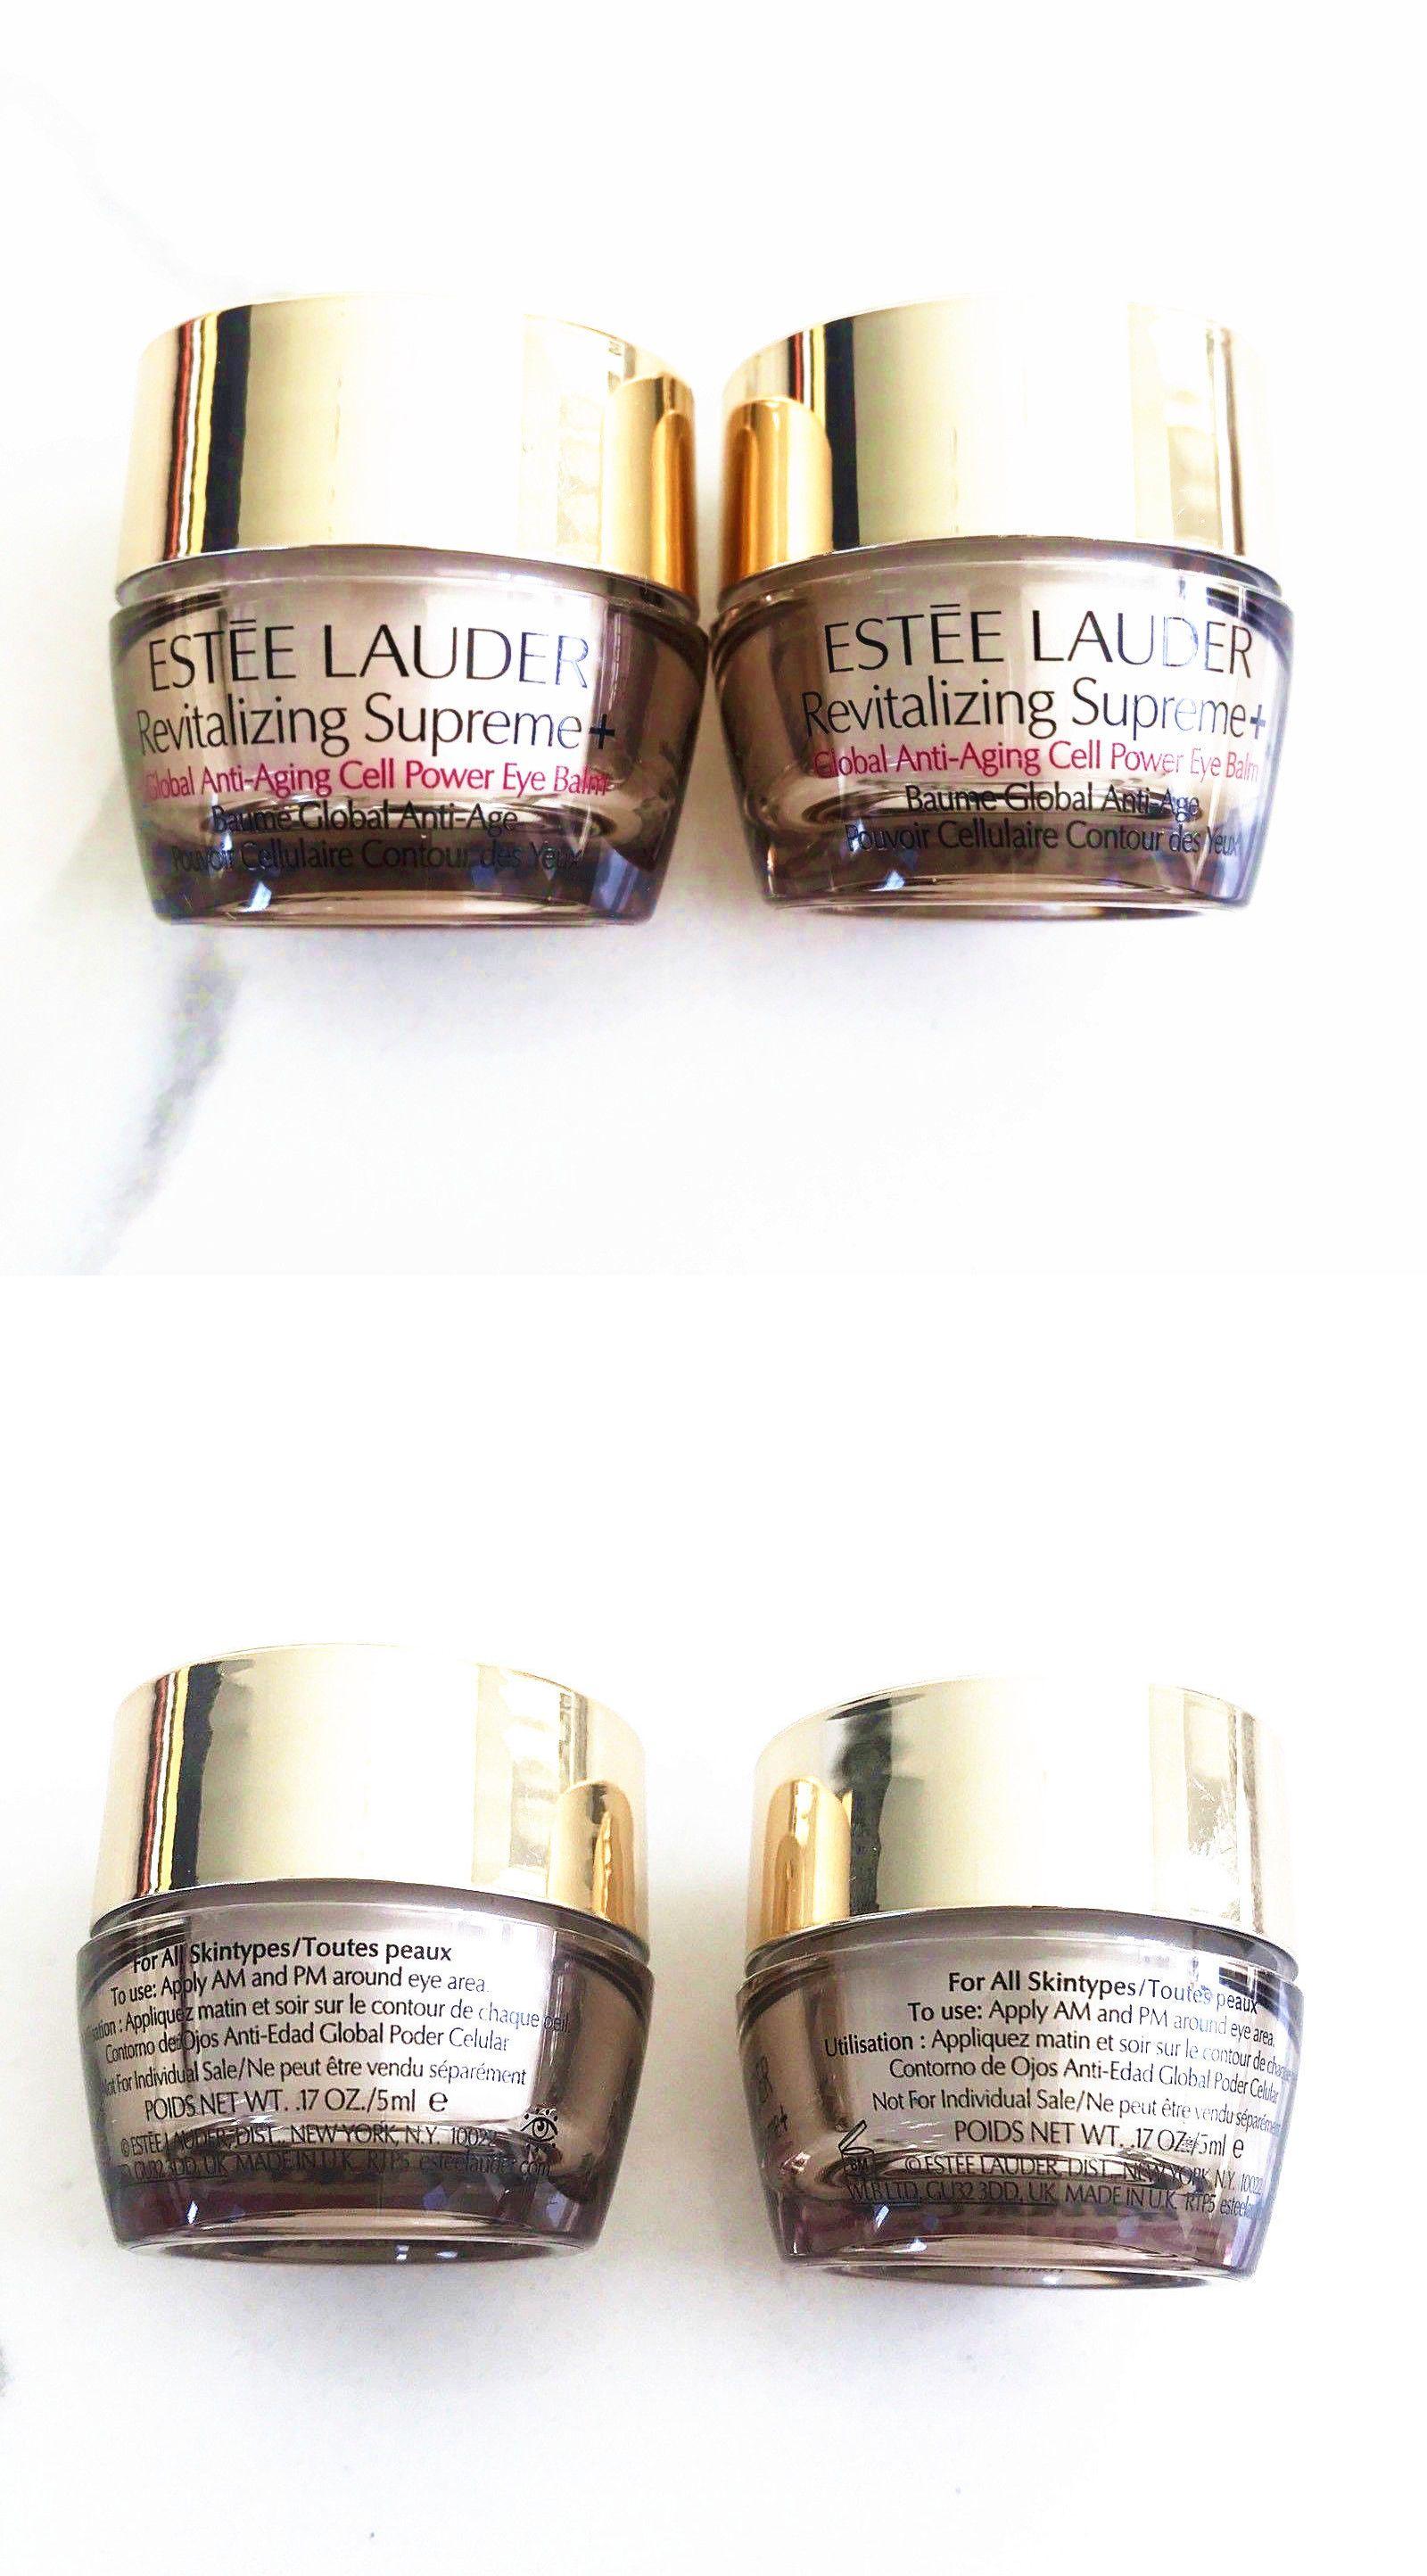 e81efa88a3d0 Eye Treatments and Masks 177764  2 5Ml Estee Lauder Revitalizing Supreme+ Global  Anti-